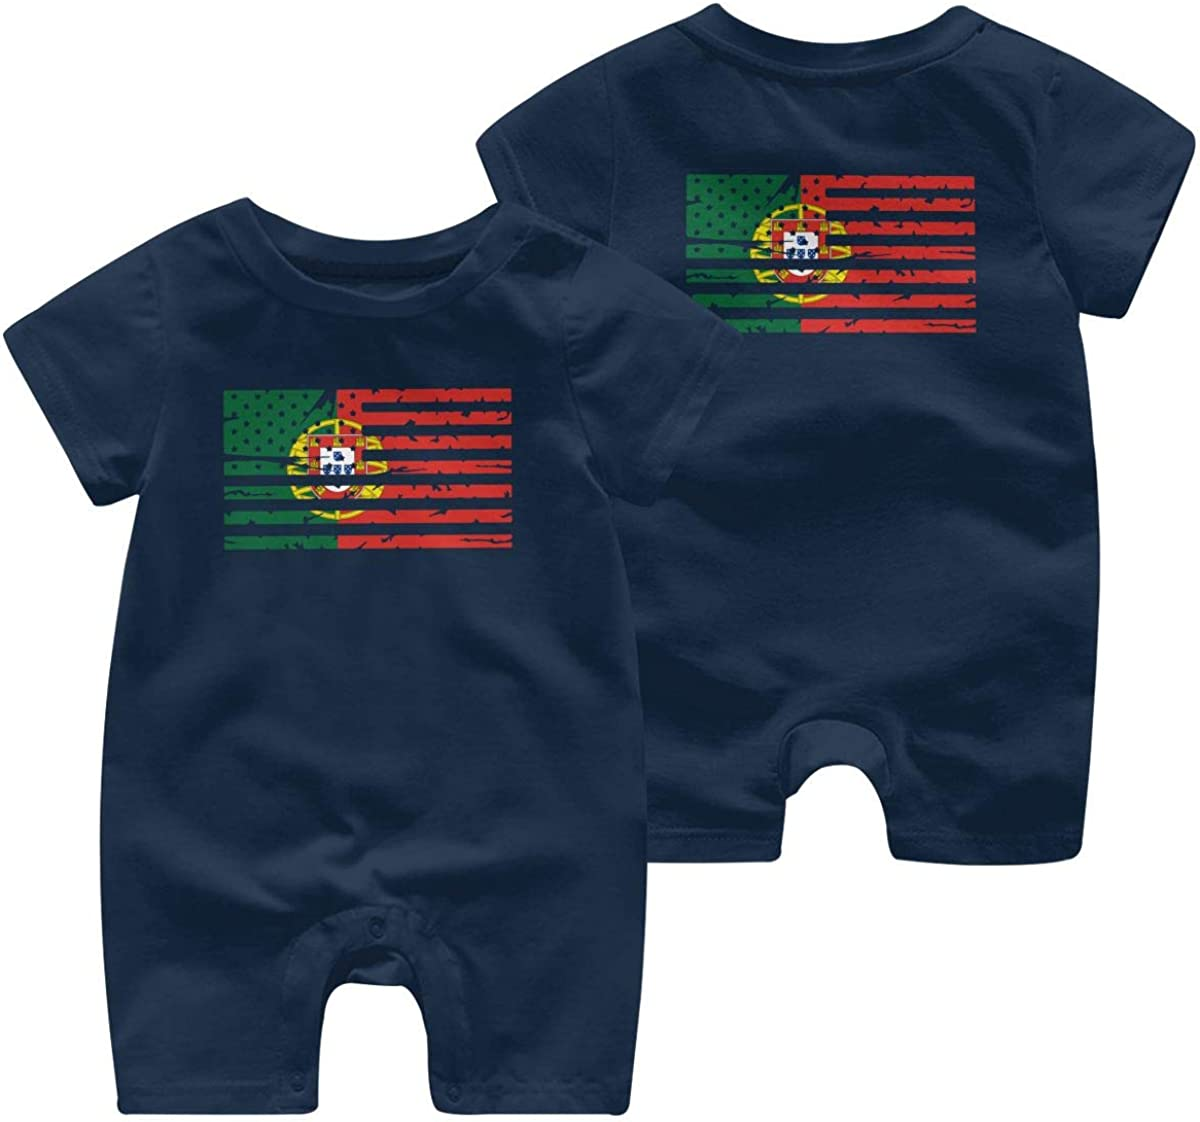 Mri-le1 Newborn Baby Bodysuits Portugal American Flag Toddler Jumpsuit